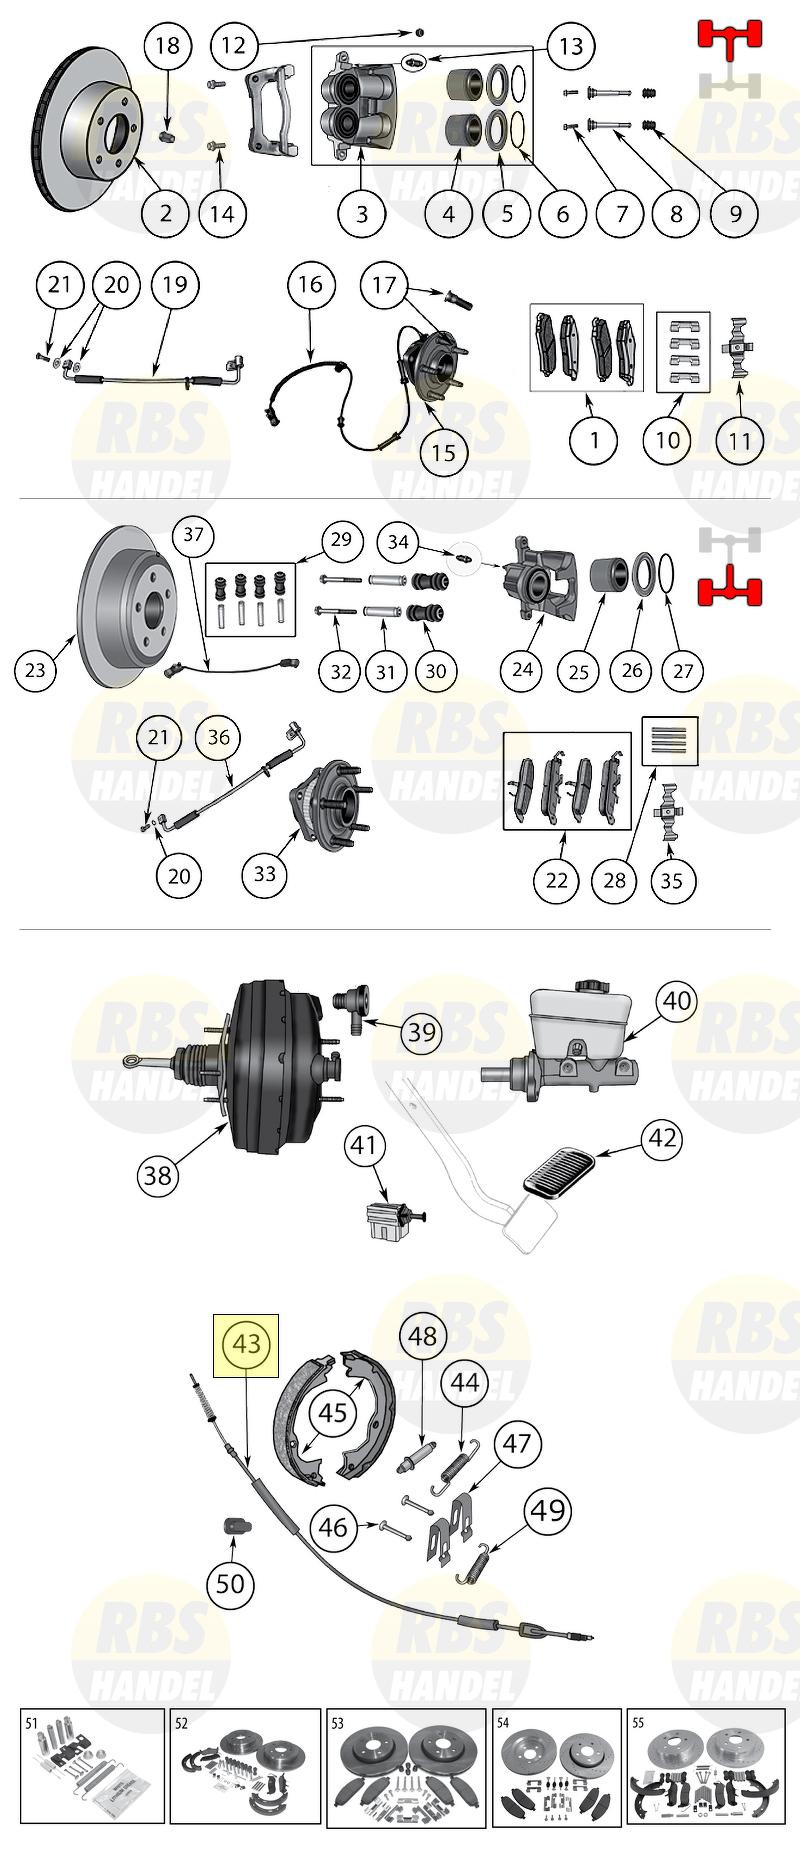 Hand Brake Cable Derecha Jeep Grand Cherokee 05-10 Commander 06-10 68024890